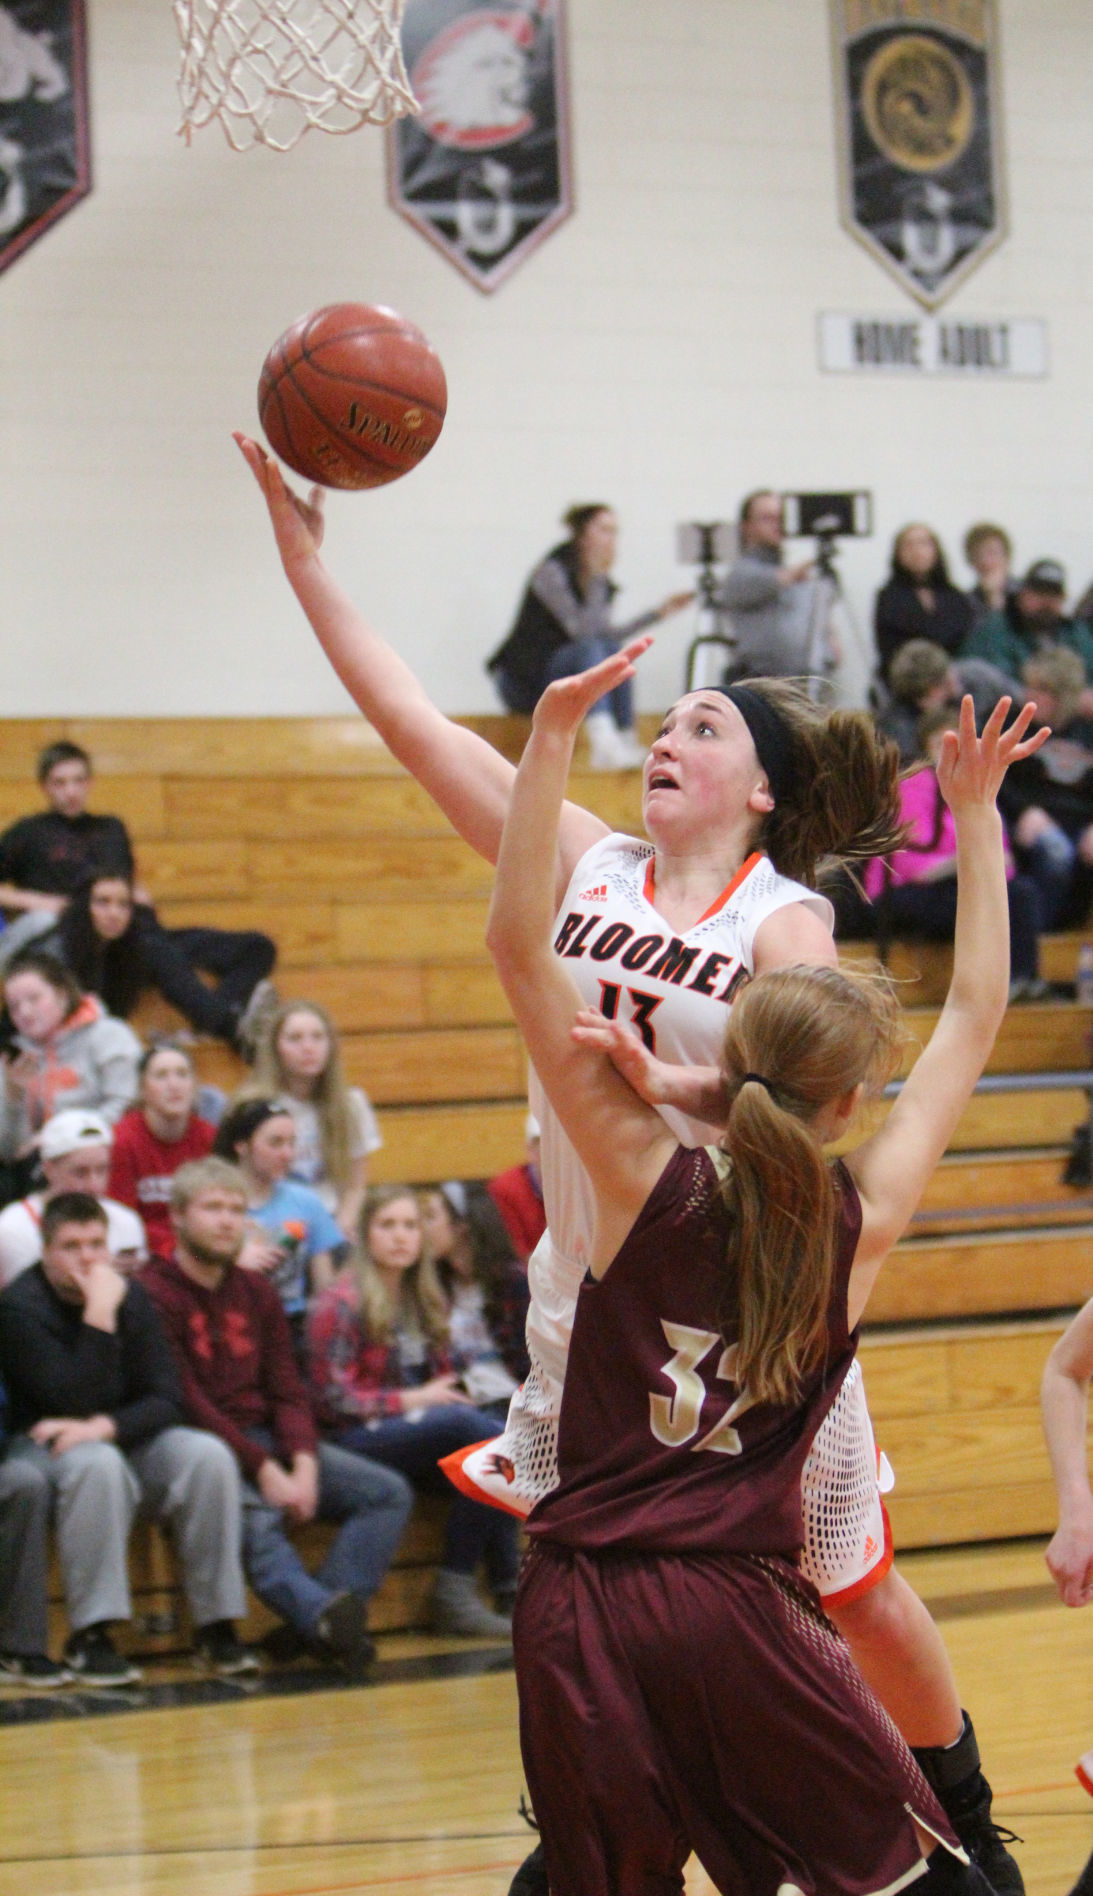 Barron at Bloomer girls basketball 2-8-18